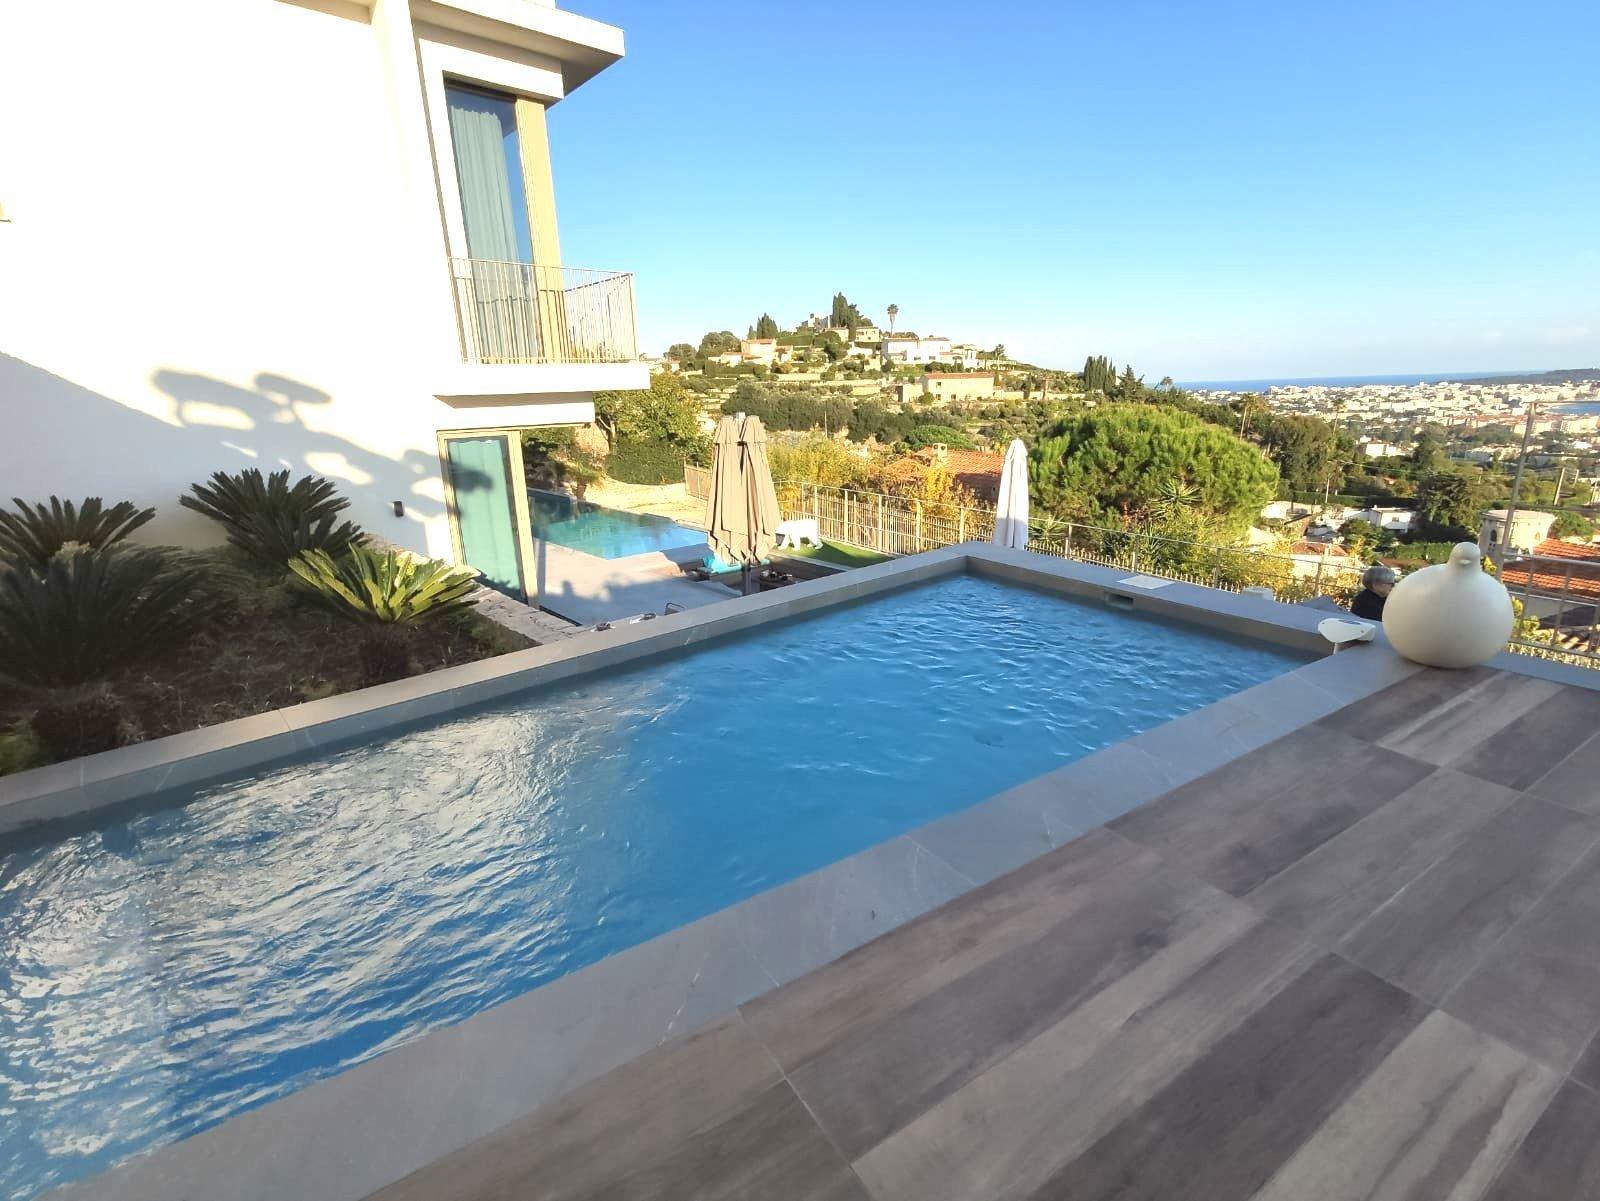 Villas vue mer panoramique